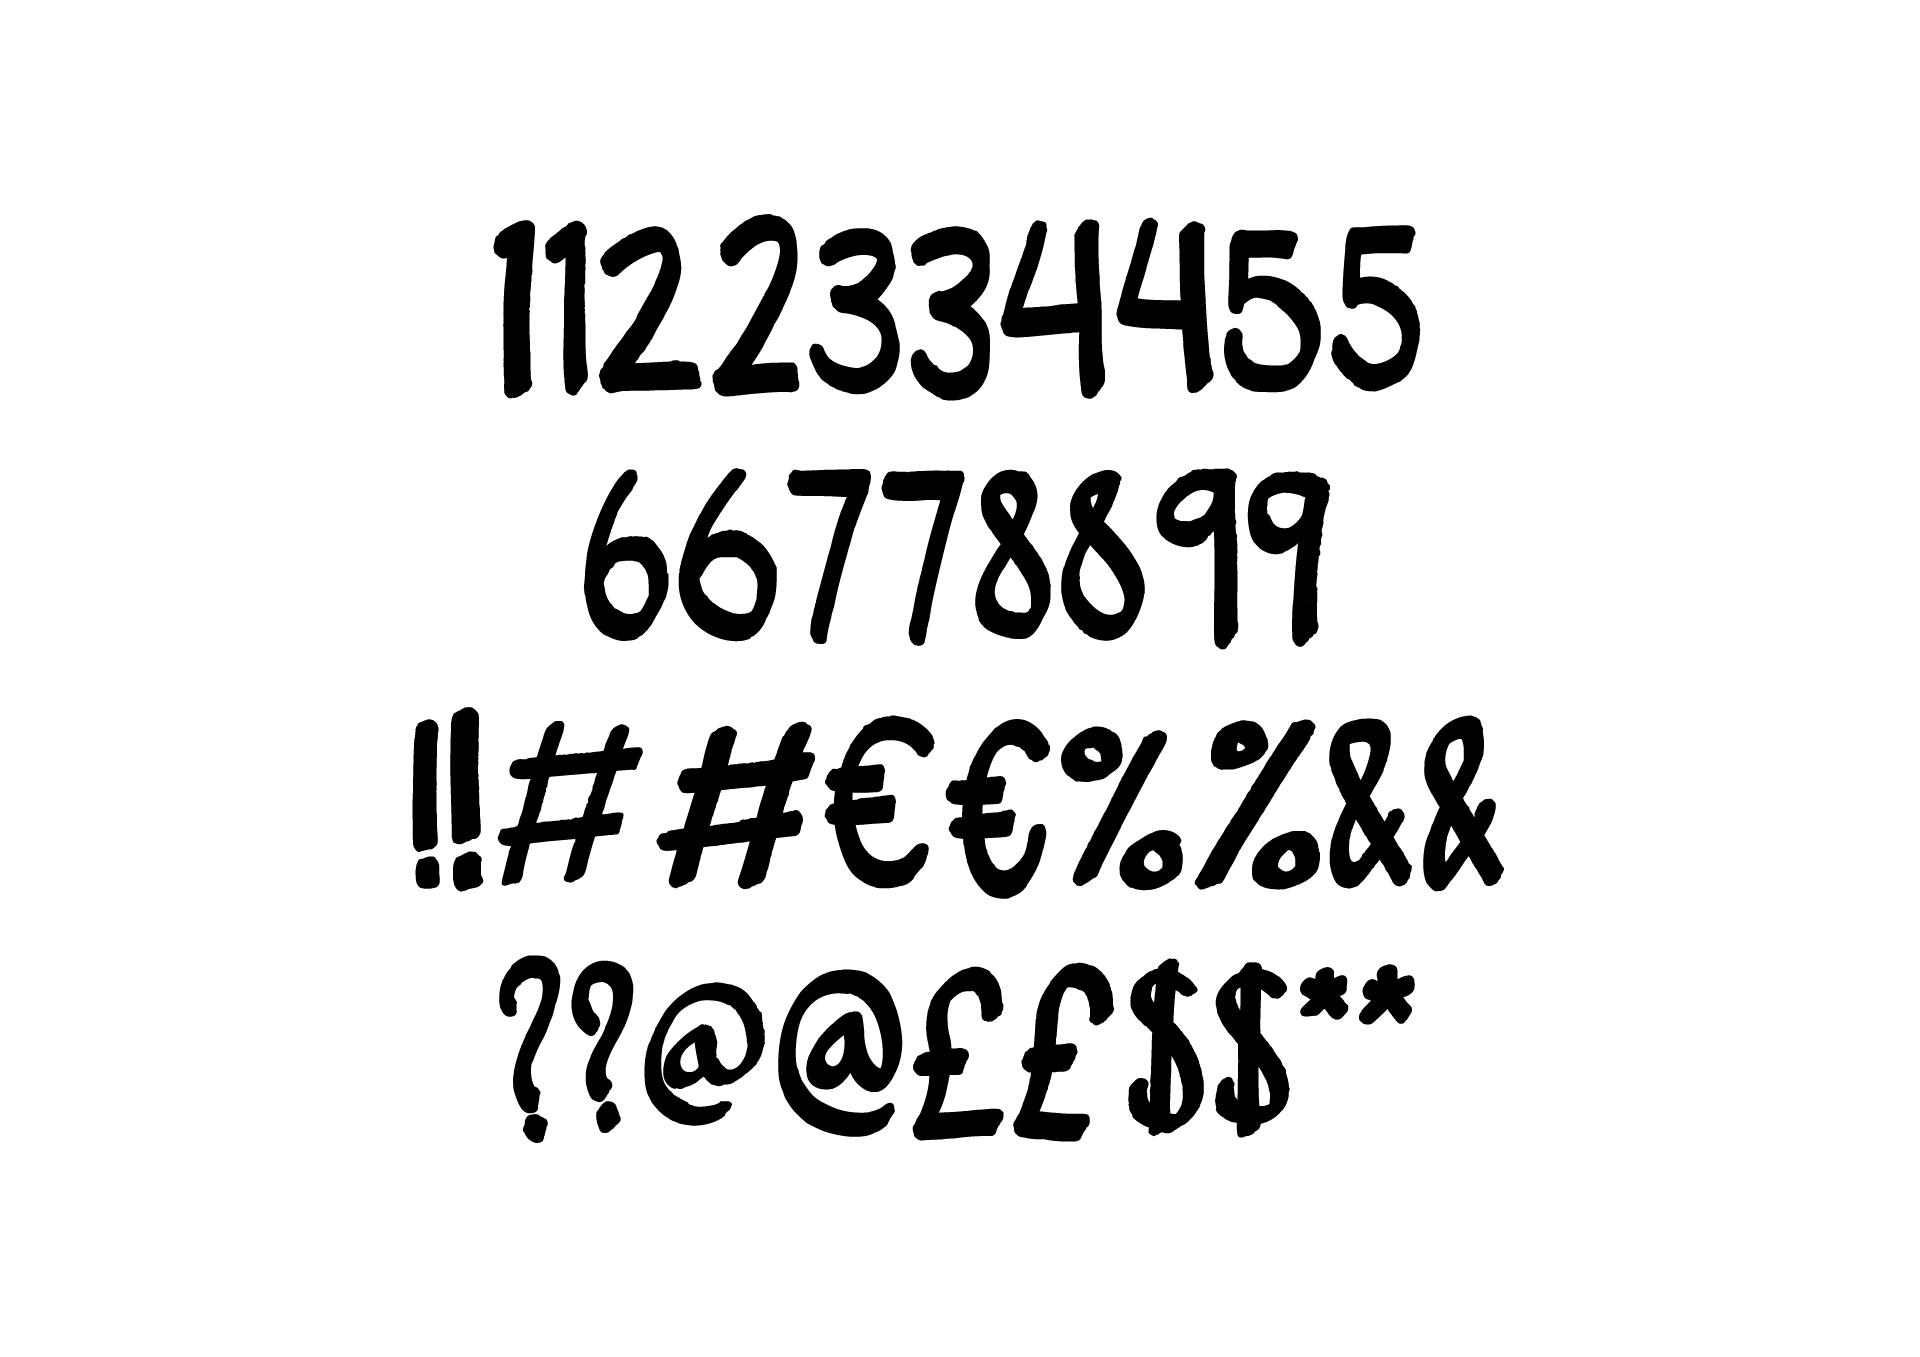 NetonNet_7_Case_Image_1920x1357